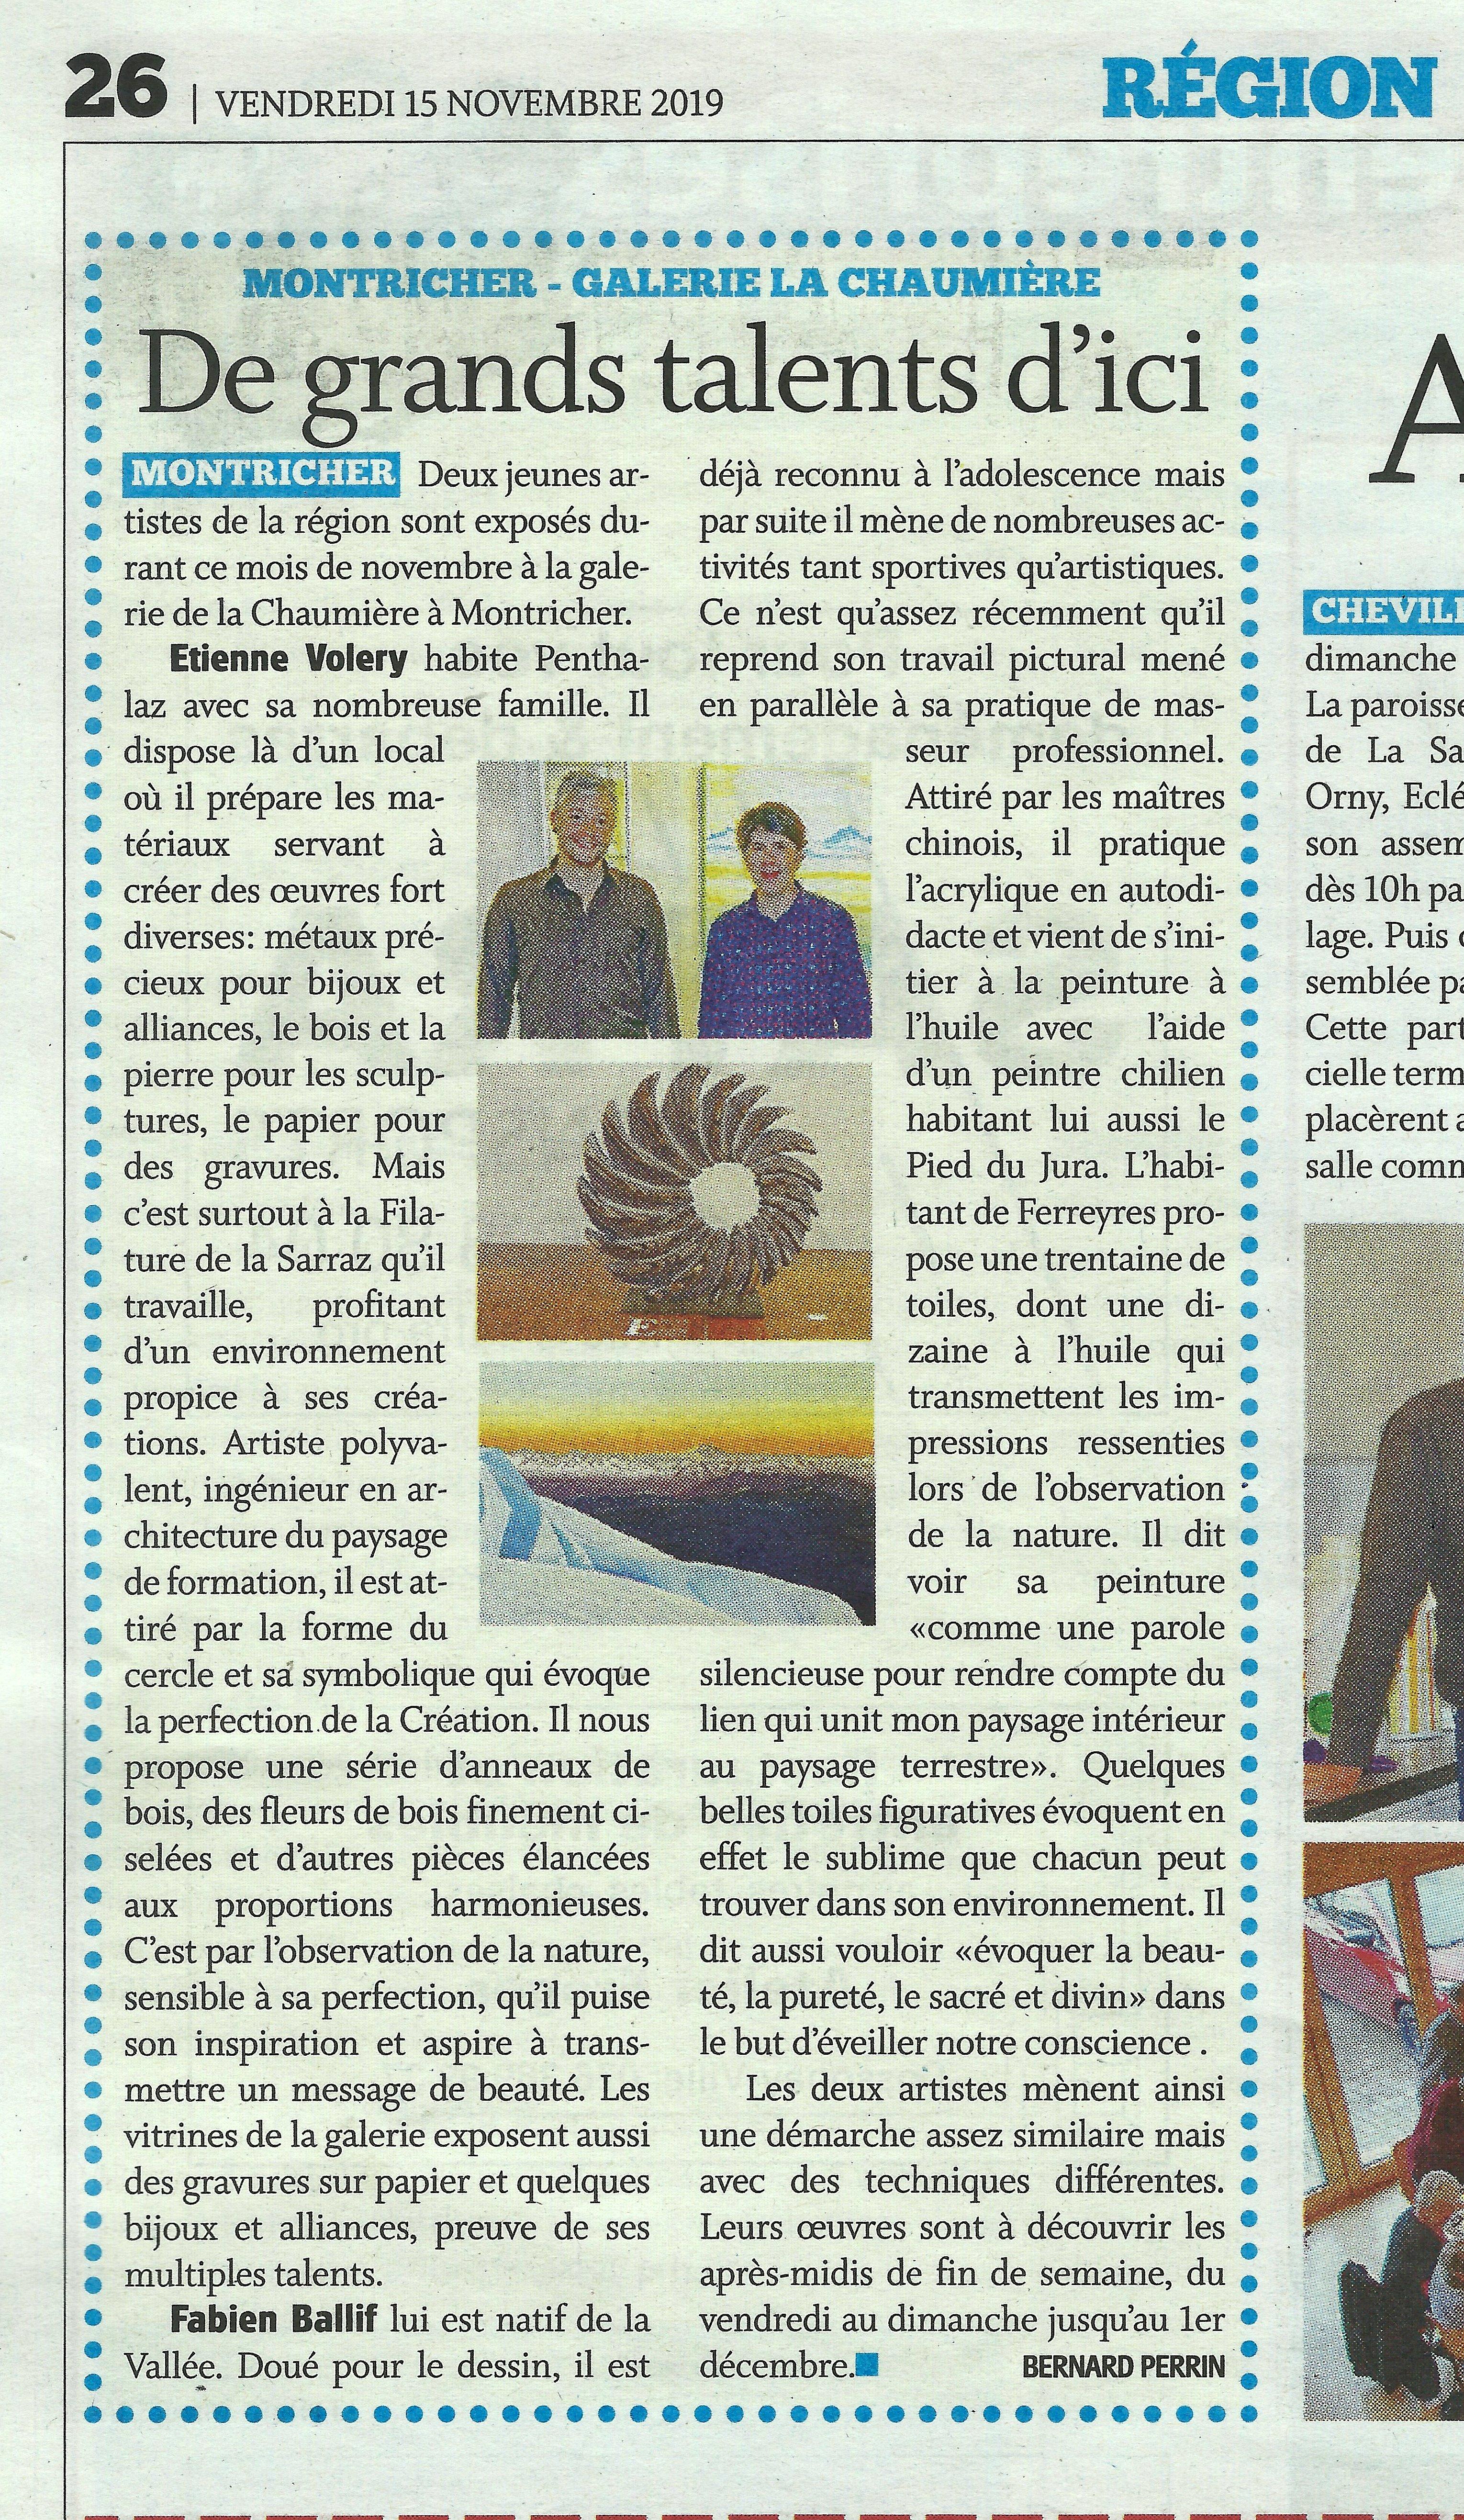 GalerieLaChaumière2019-journaldecoss15